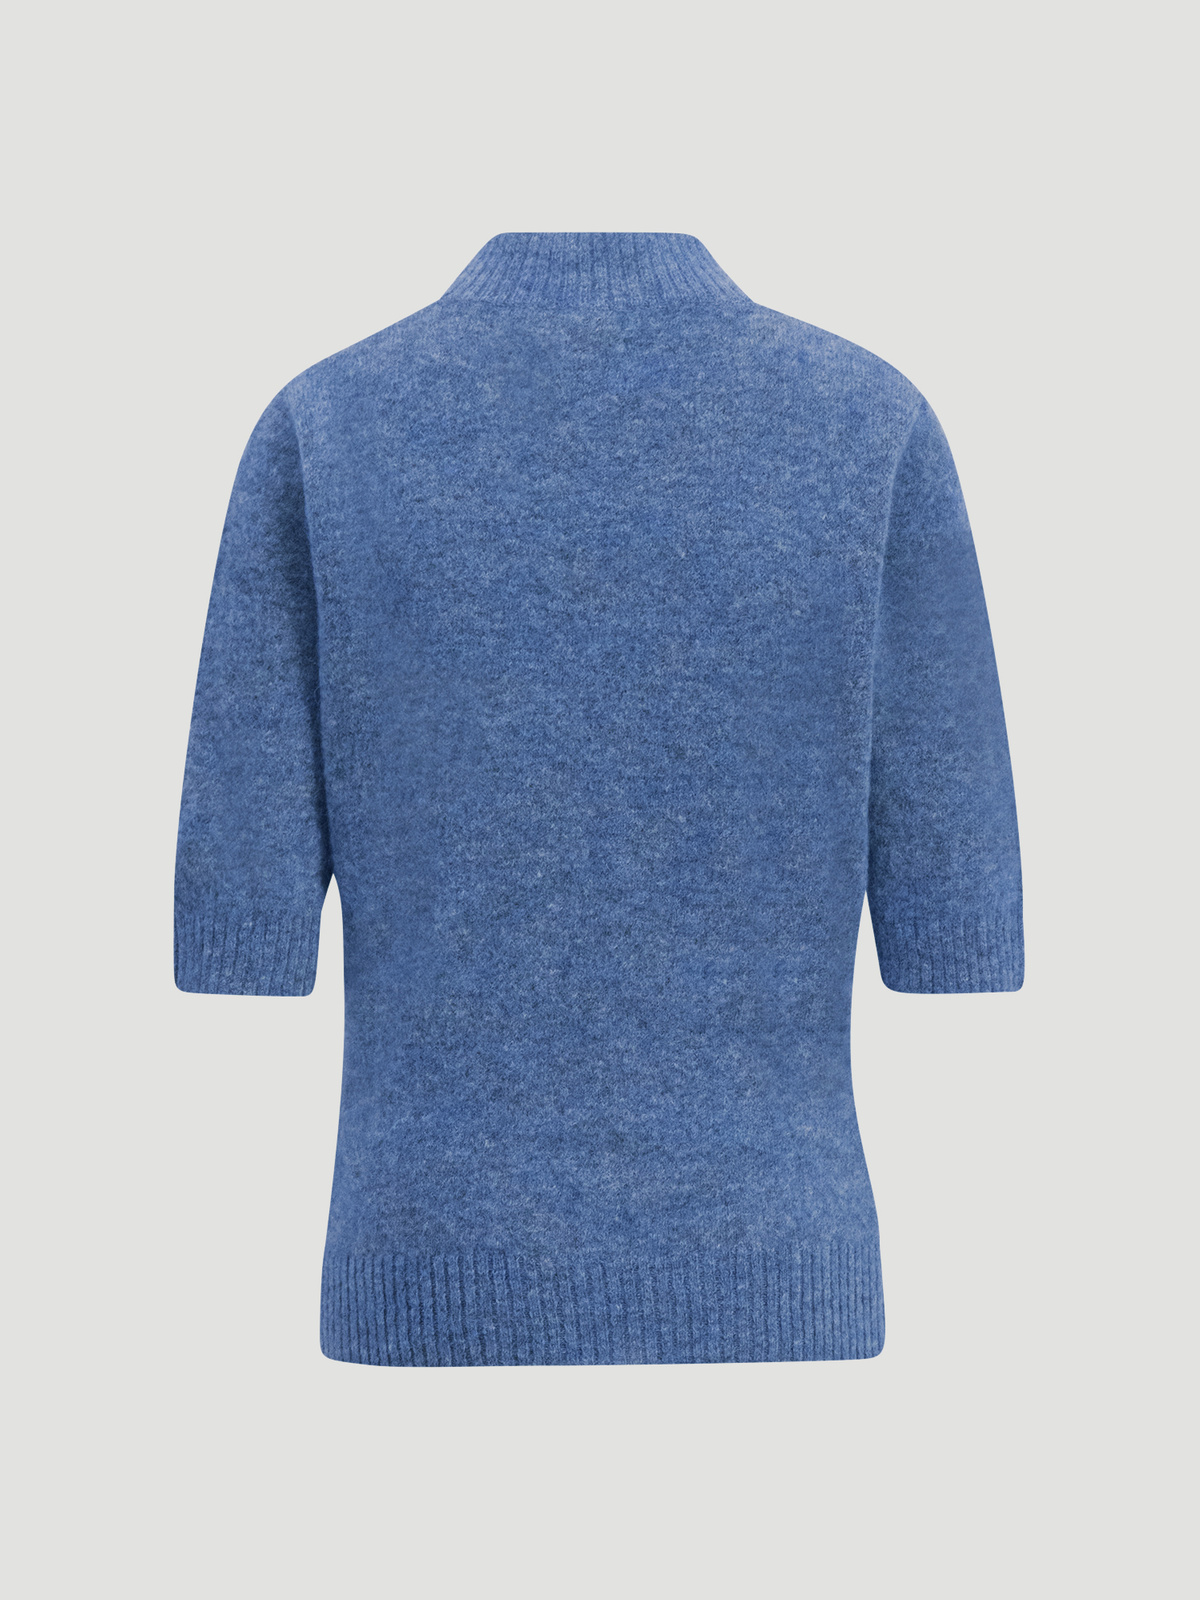 Puff Knit Tee  Blue 6